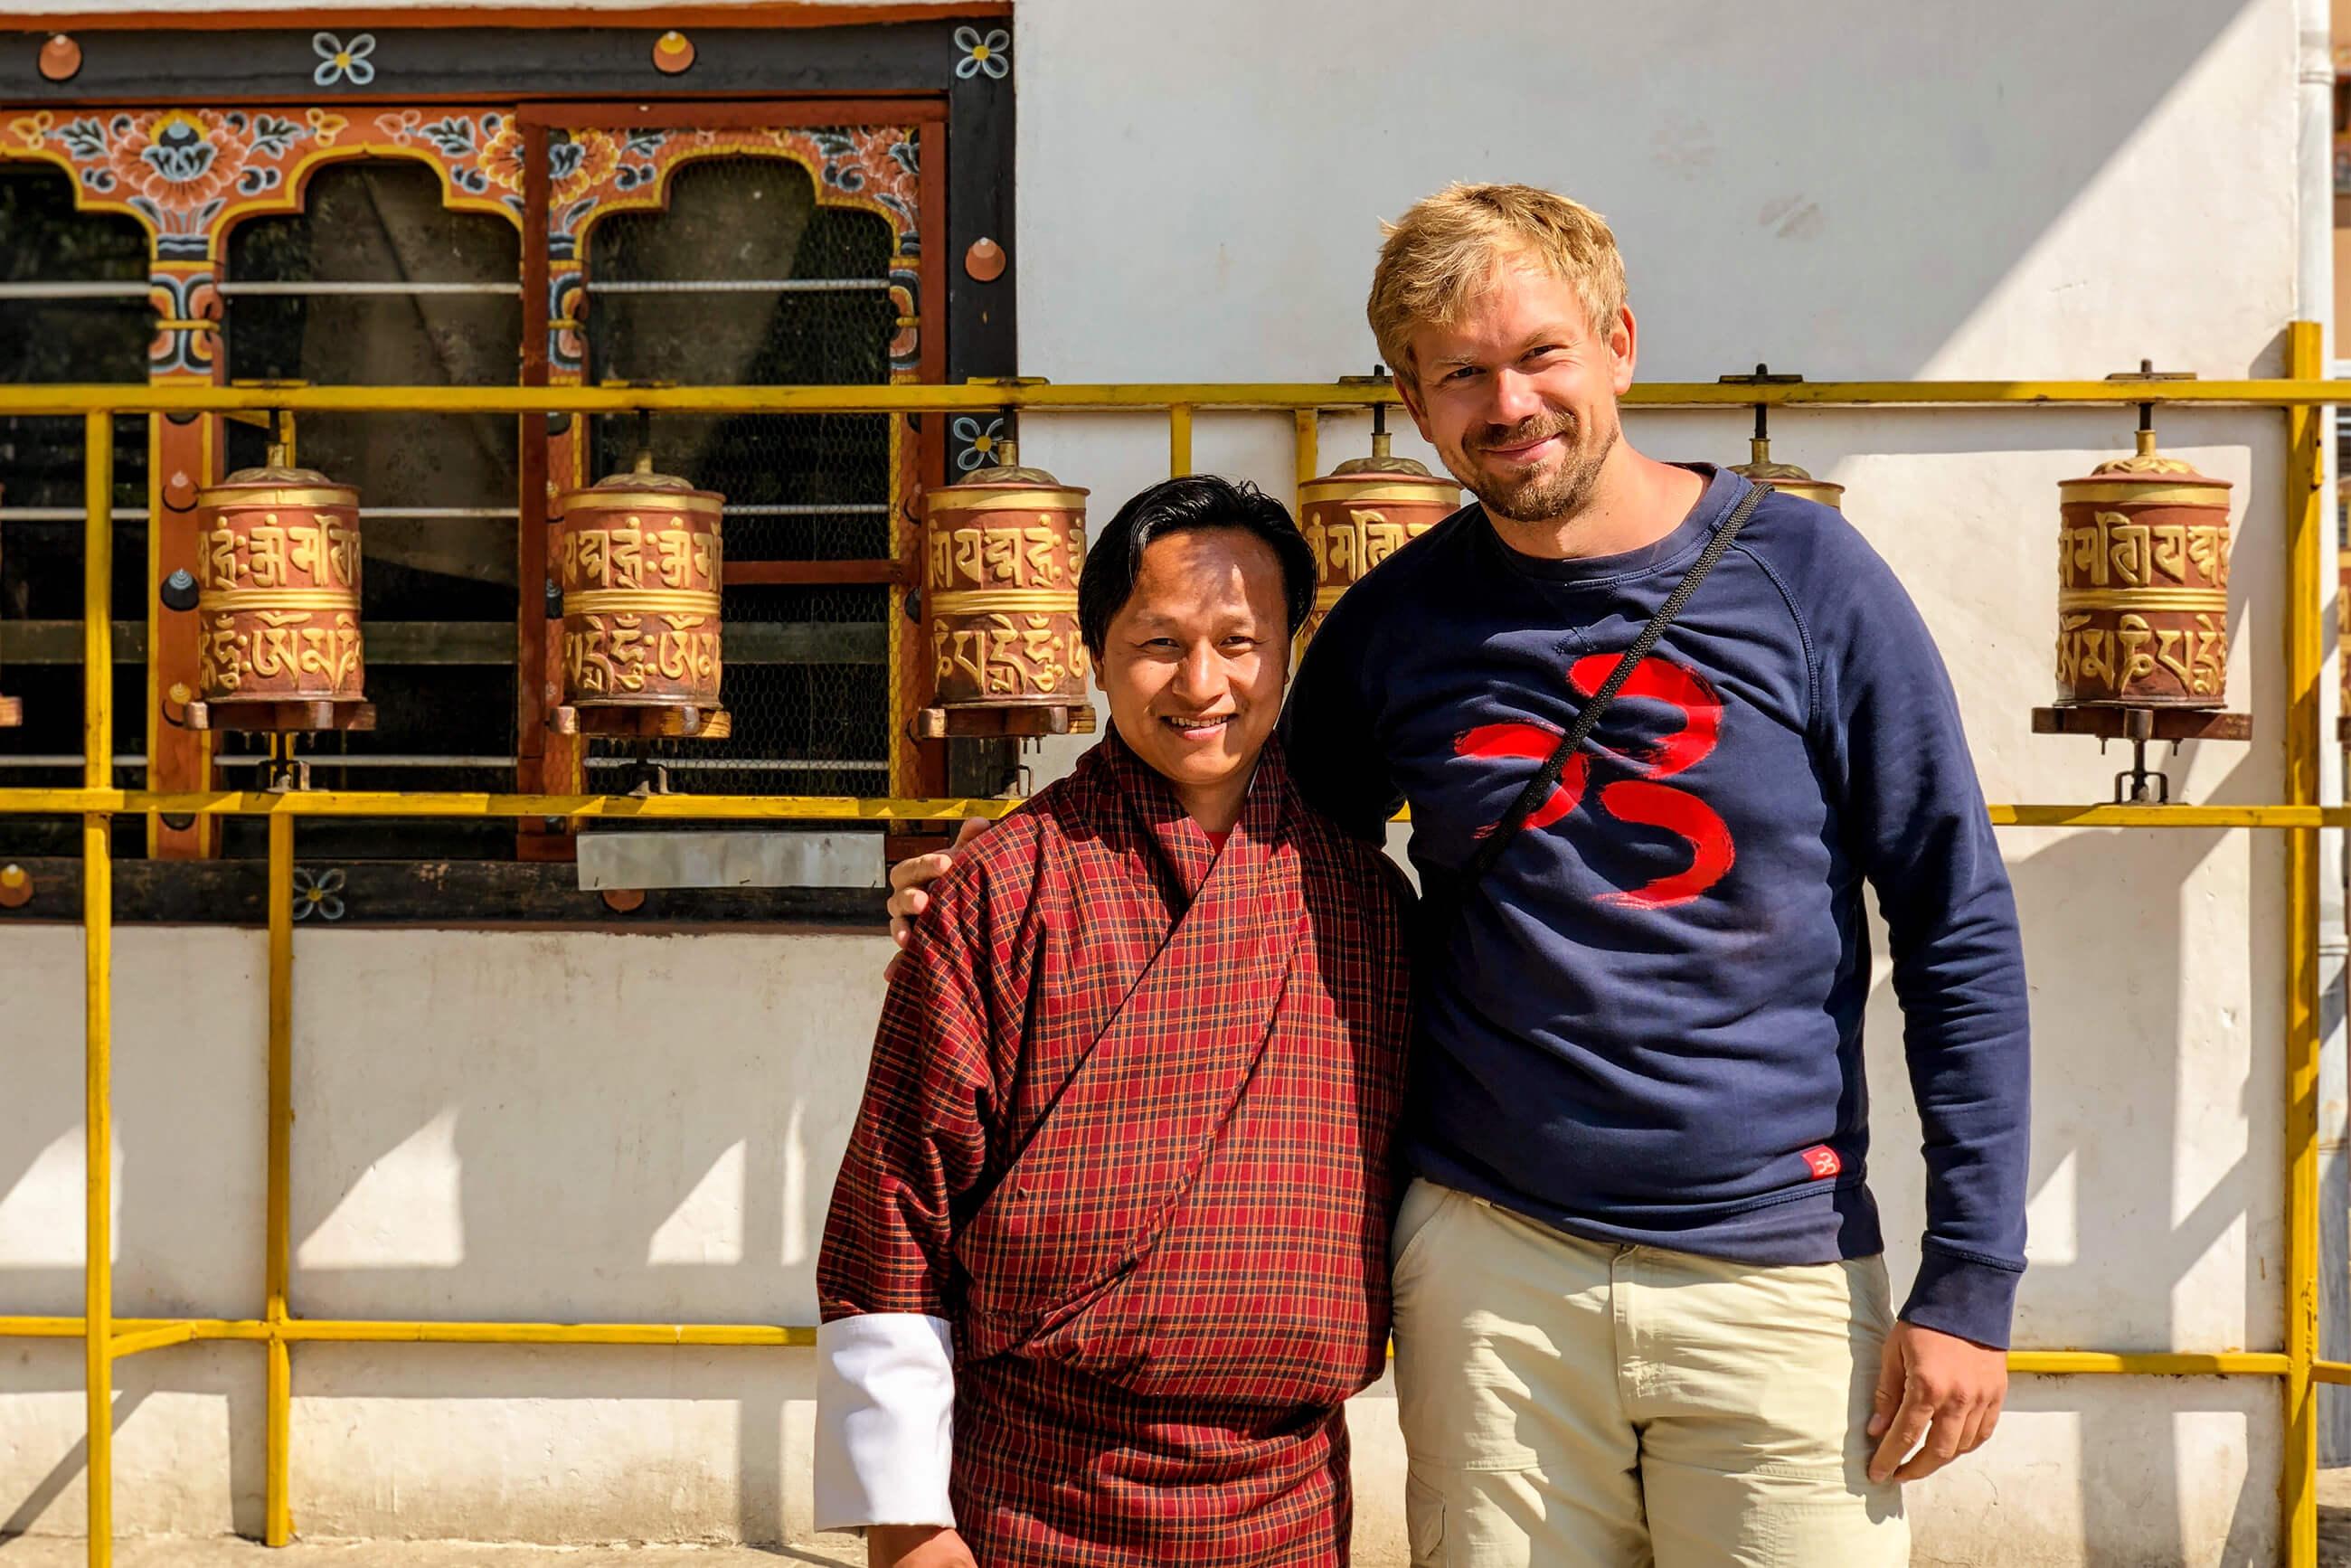 https://bubo.sk/uploads/galleries/4914/roberttaraba_bhutan_local-5.jpg